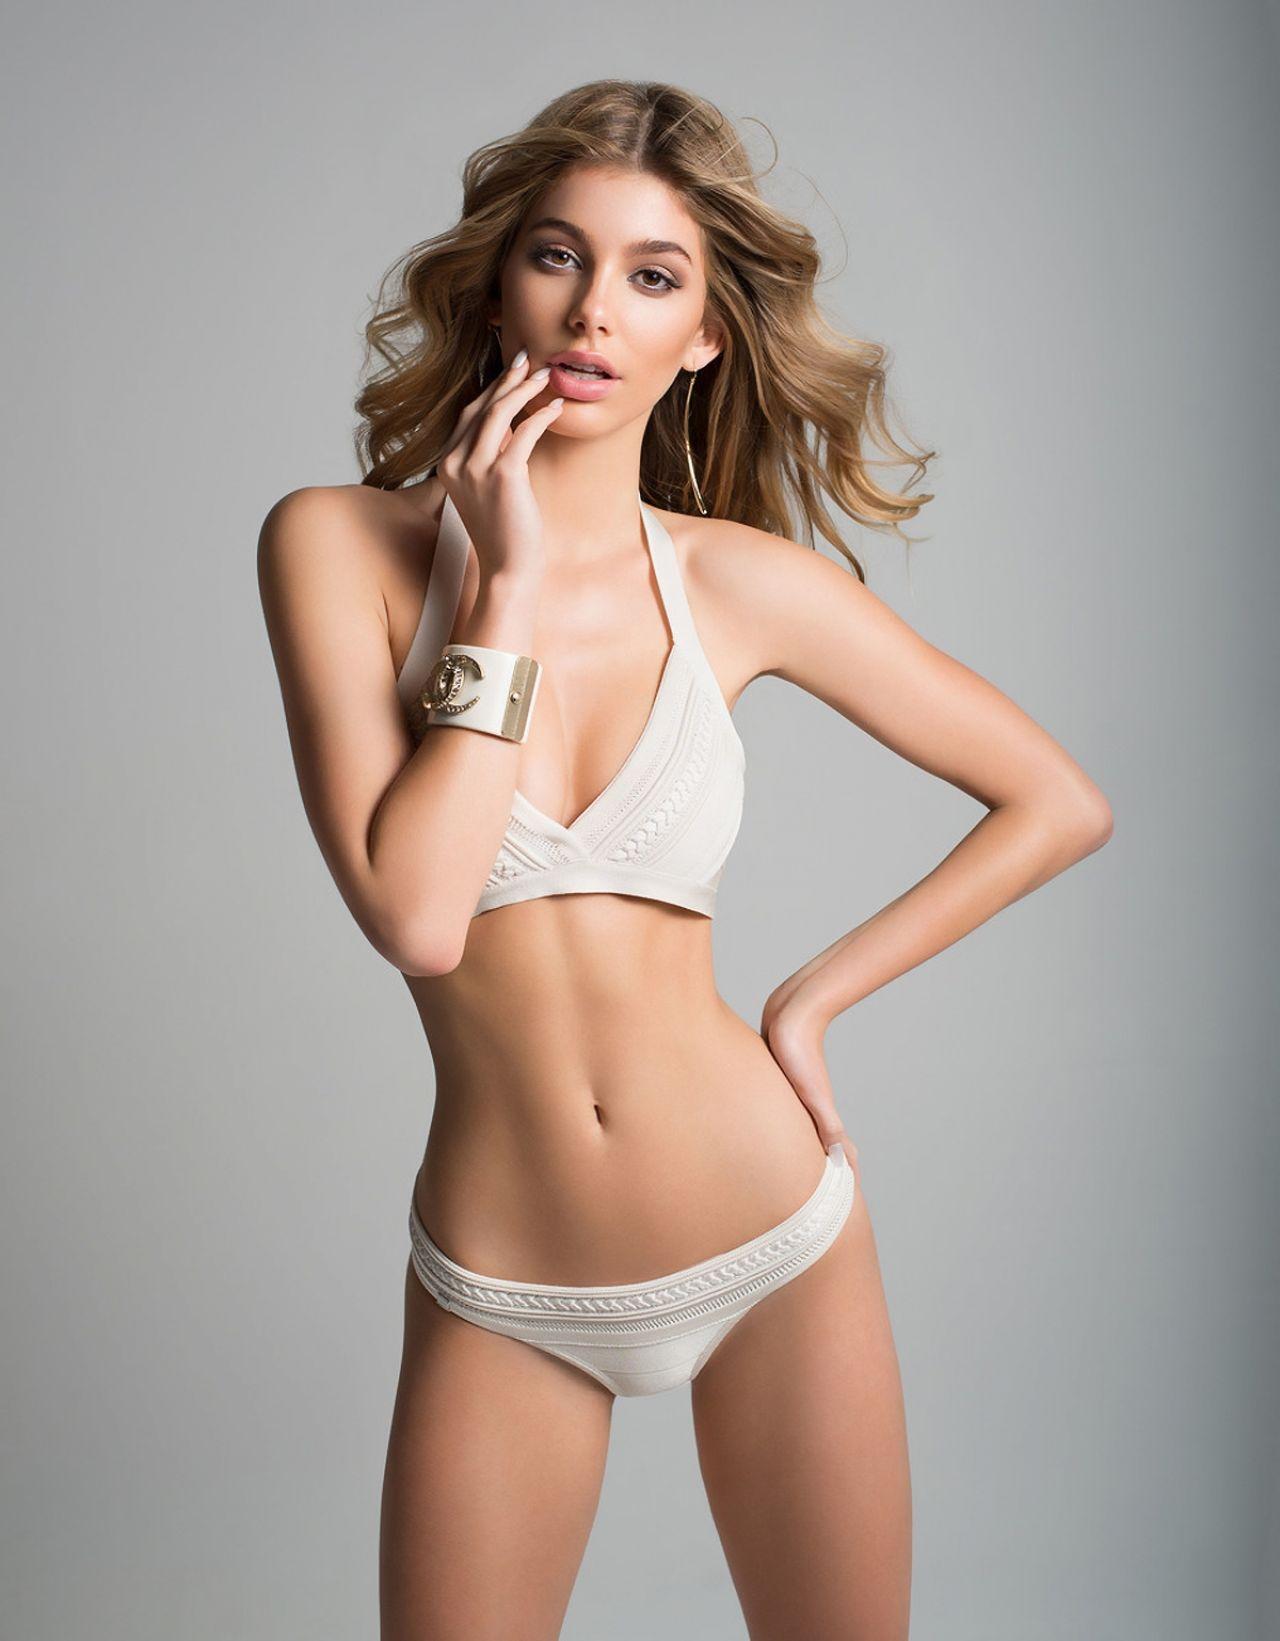 Bikini Cami Morrone nudes (11 photo), Ass, Hot, Selfie, underwear 2020